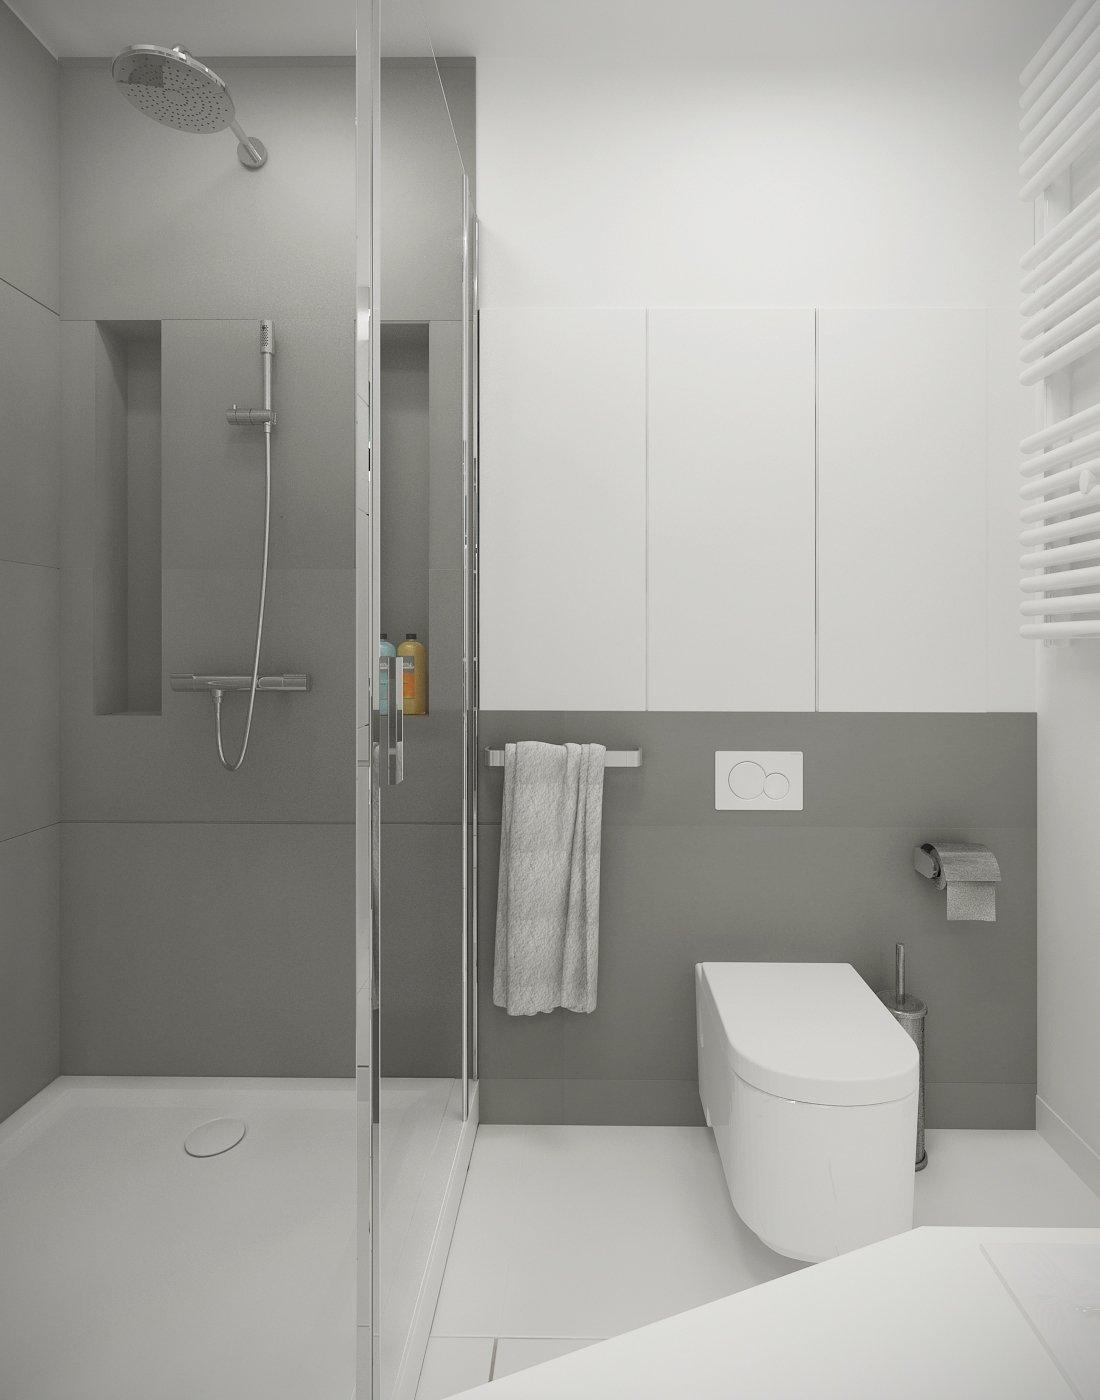 10 Elegant Grey And White Bathroom Ideas home design ideas grey and white bathroom ideas gray and ada 2020